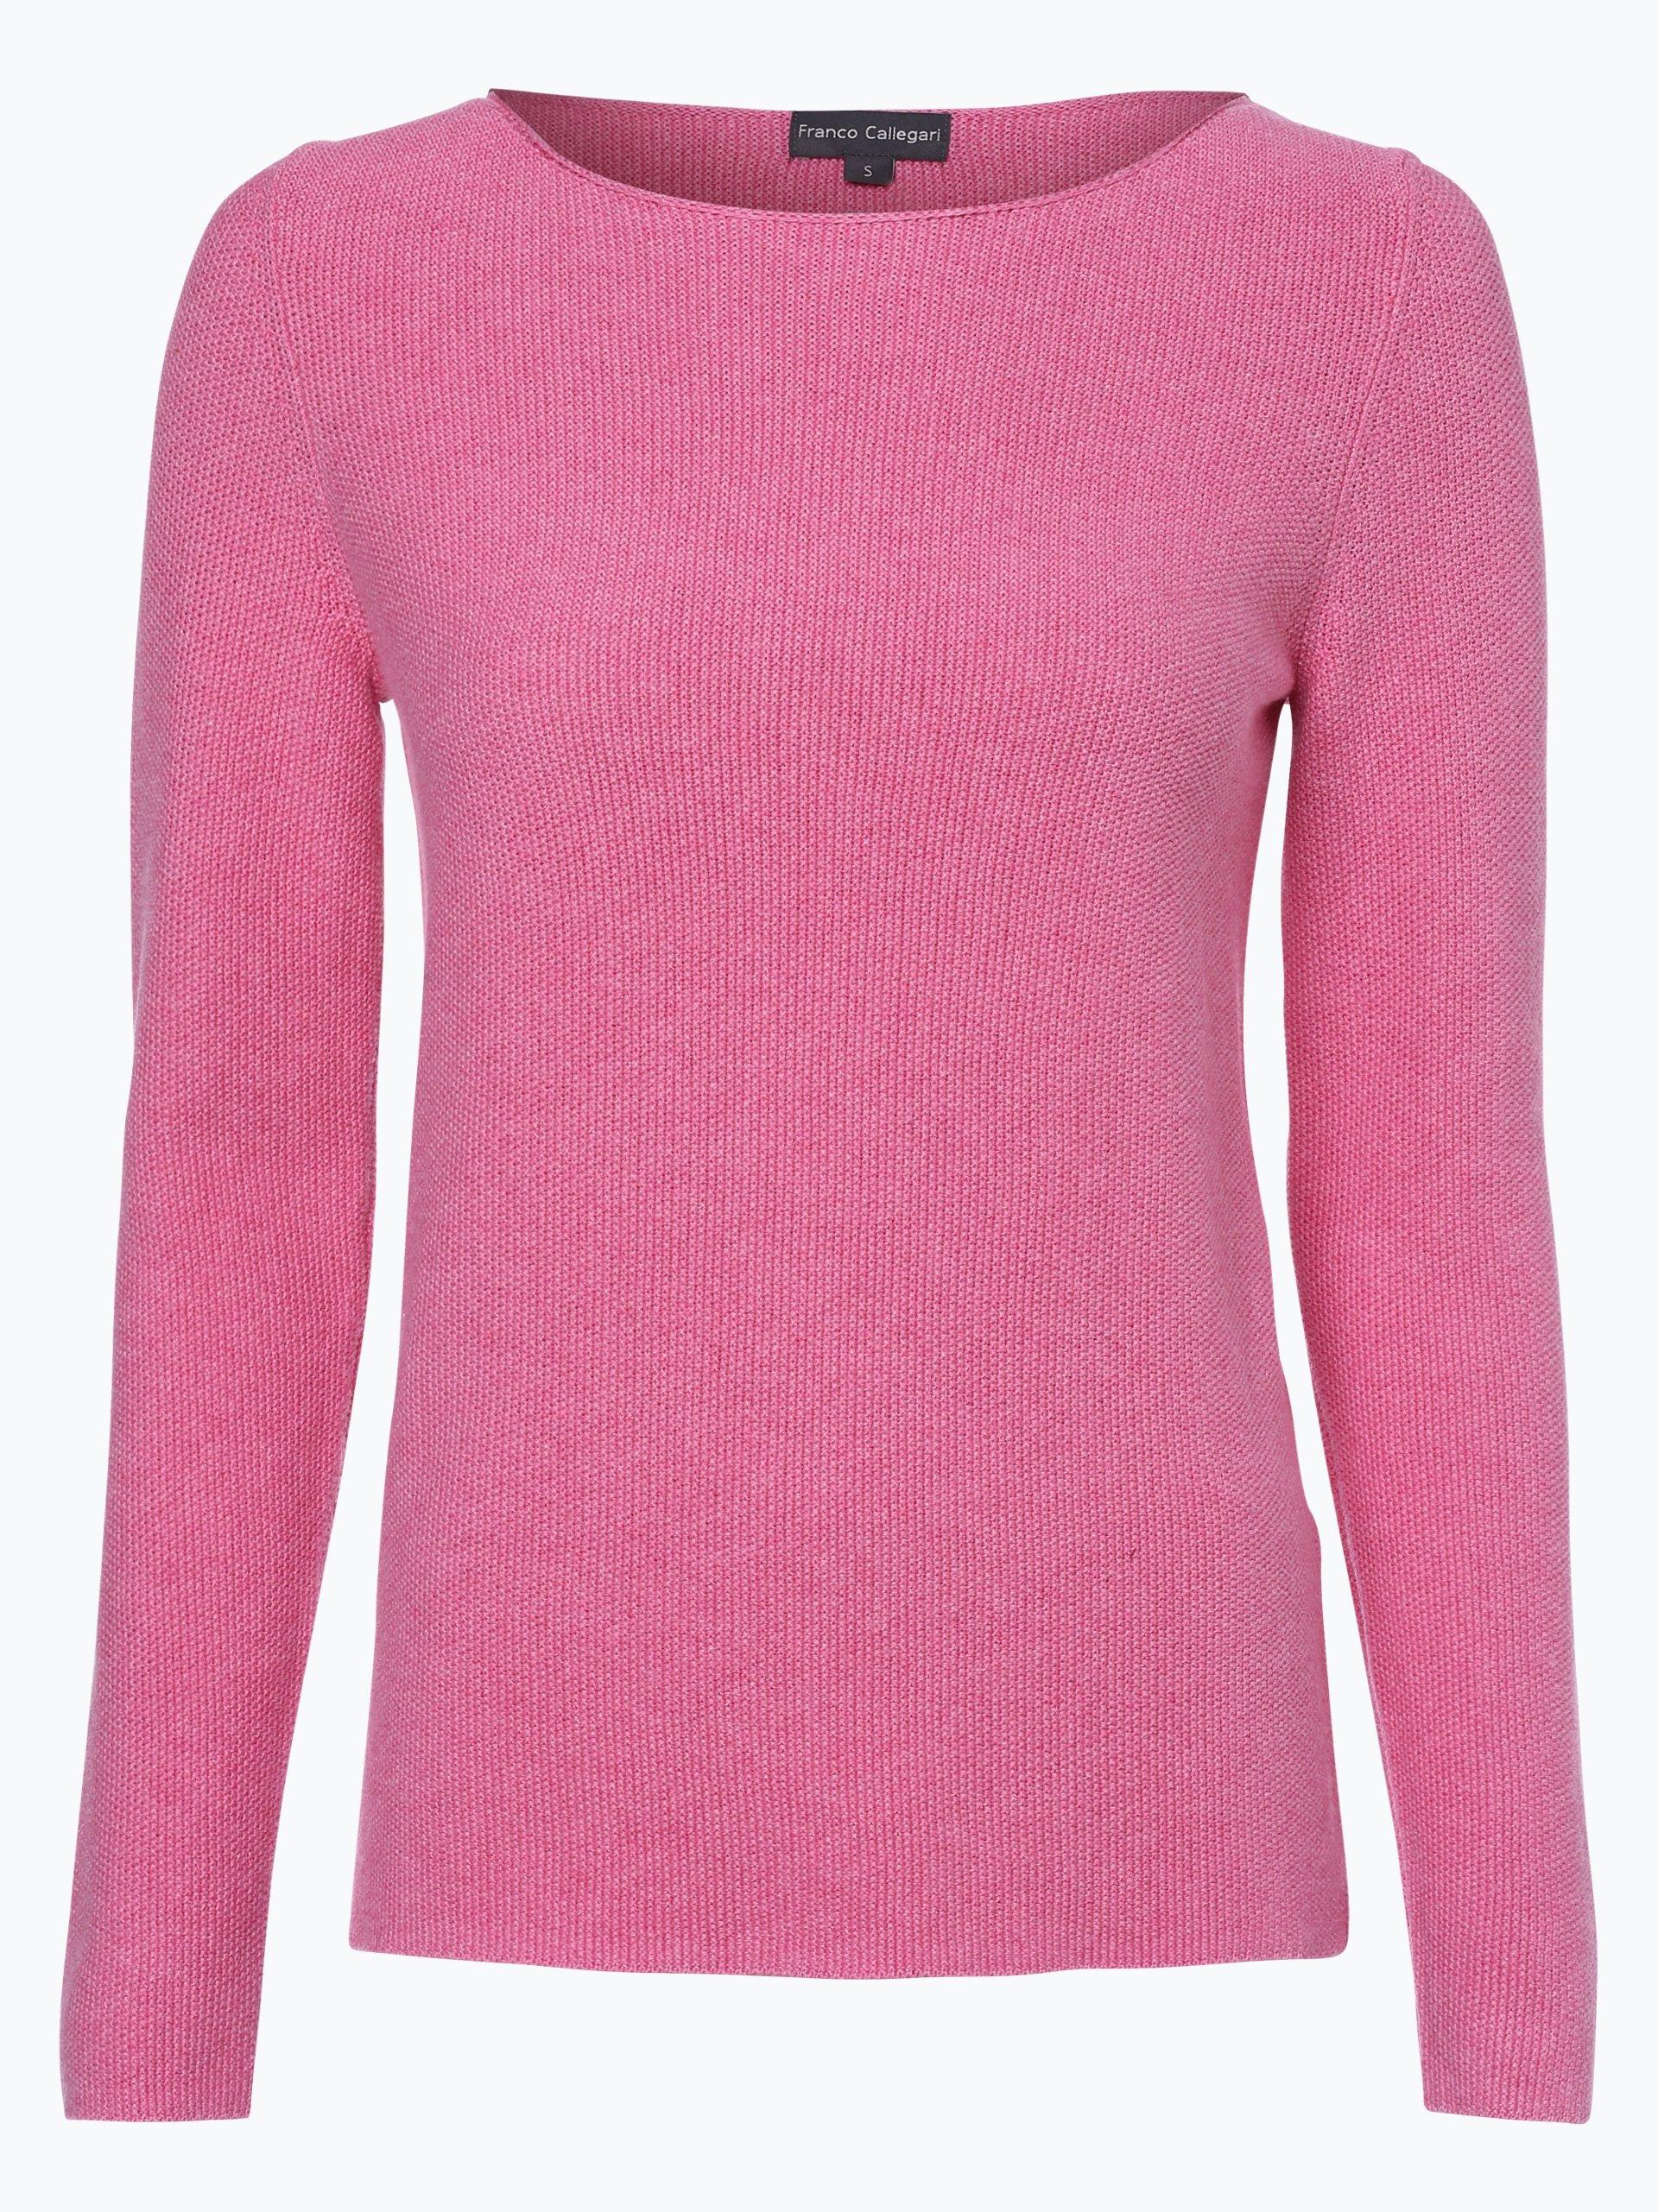 franco callegari damen pullover pink uni online kaufen. Black Bedroom Furniture Sets. Home Design Ideas